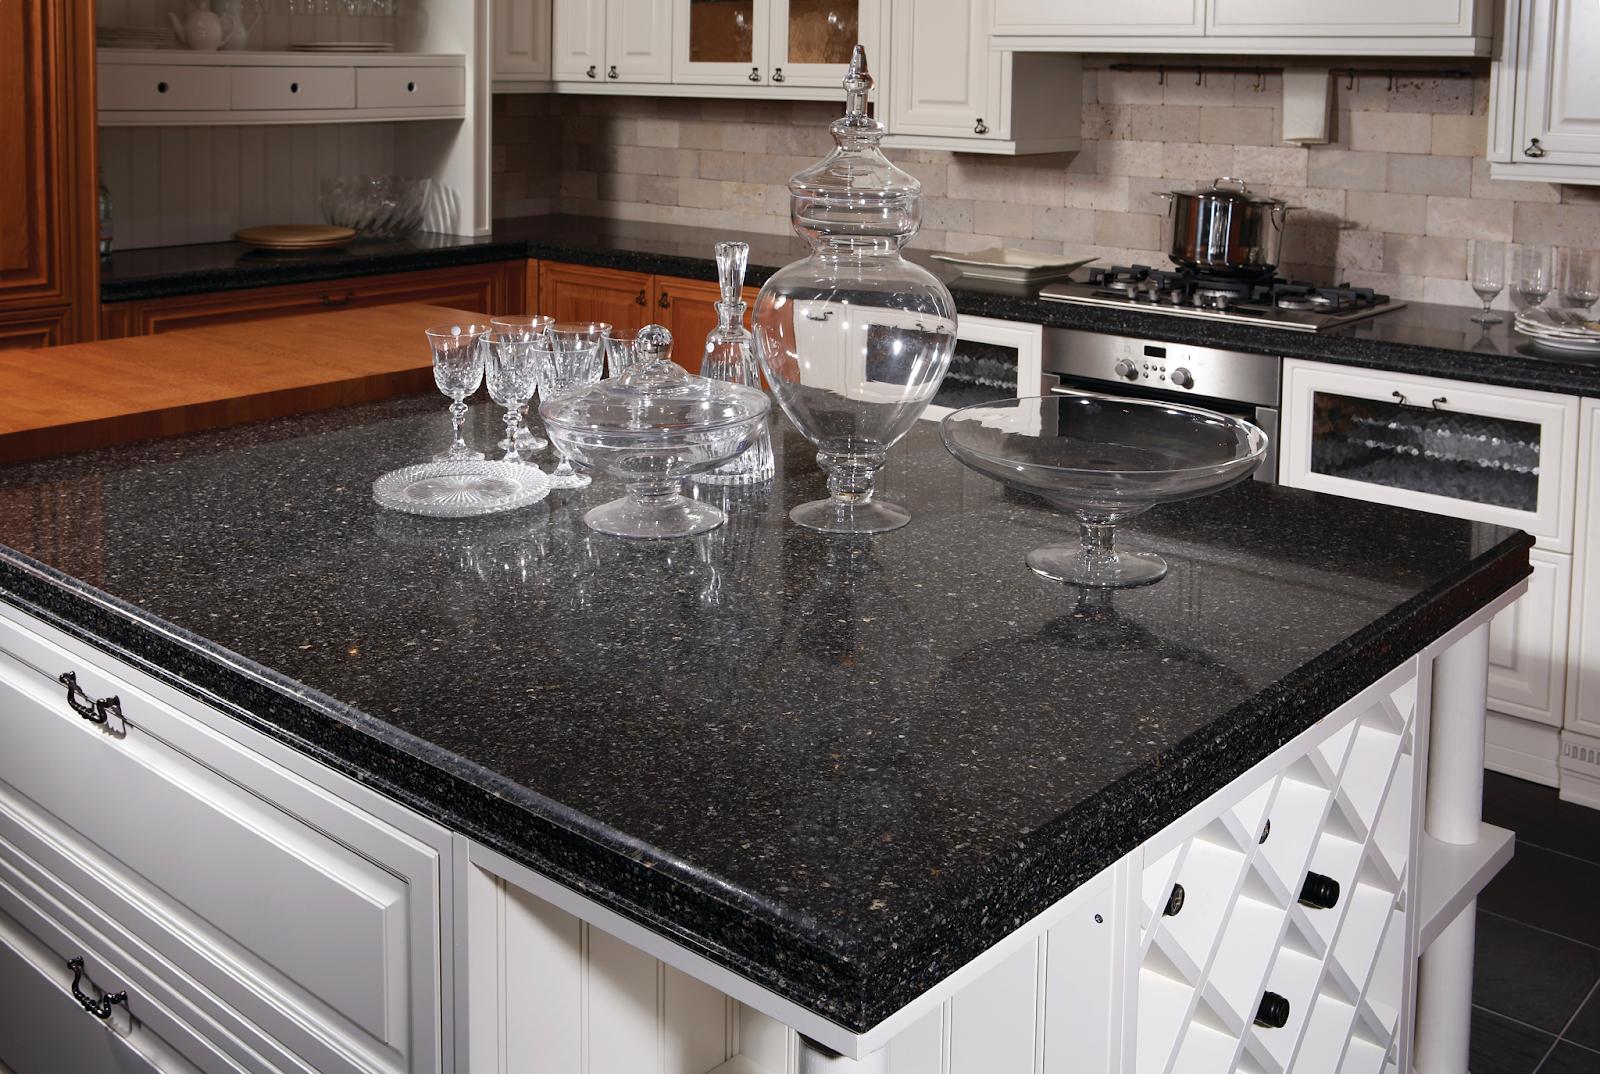 9 stunning black quartz countertops design ideas black quartz countertops black quartz on kitchen decor black countertop id=25262